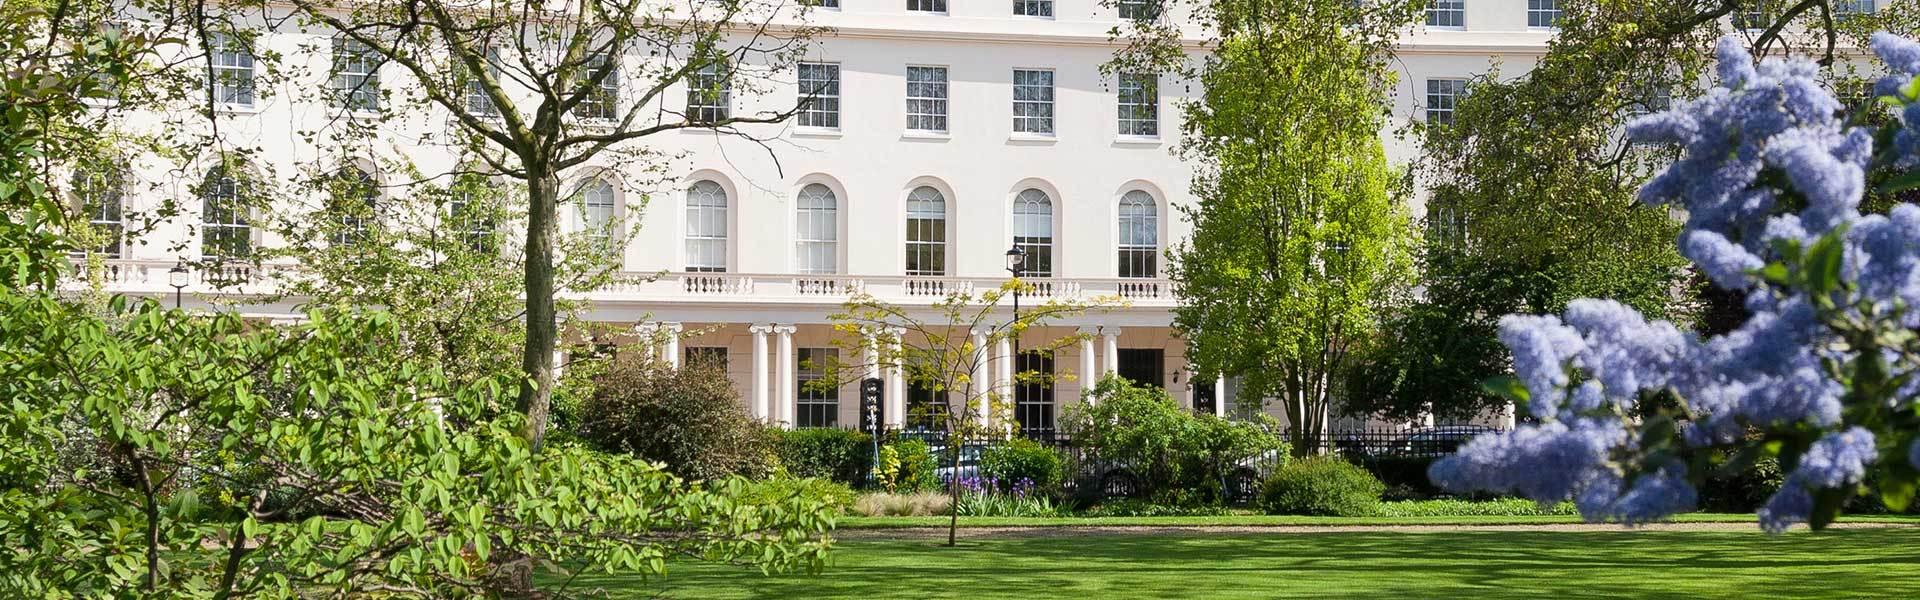 Business Premises To Let, Workspace London, Commercial Property London